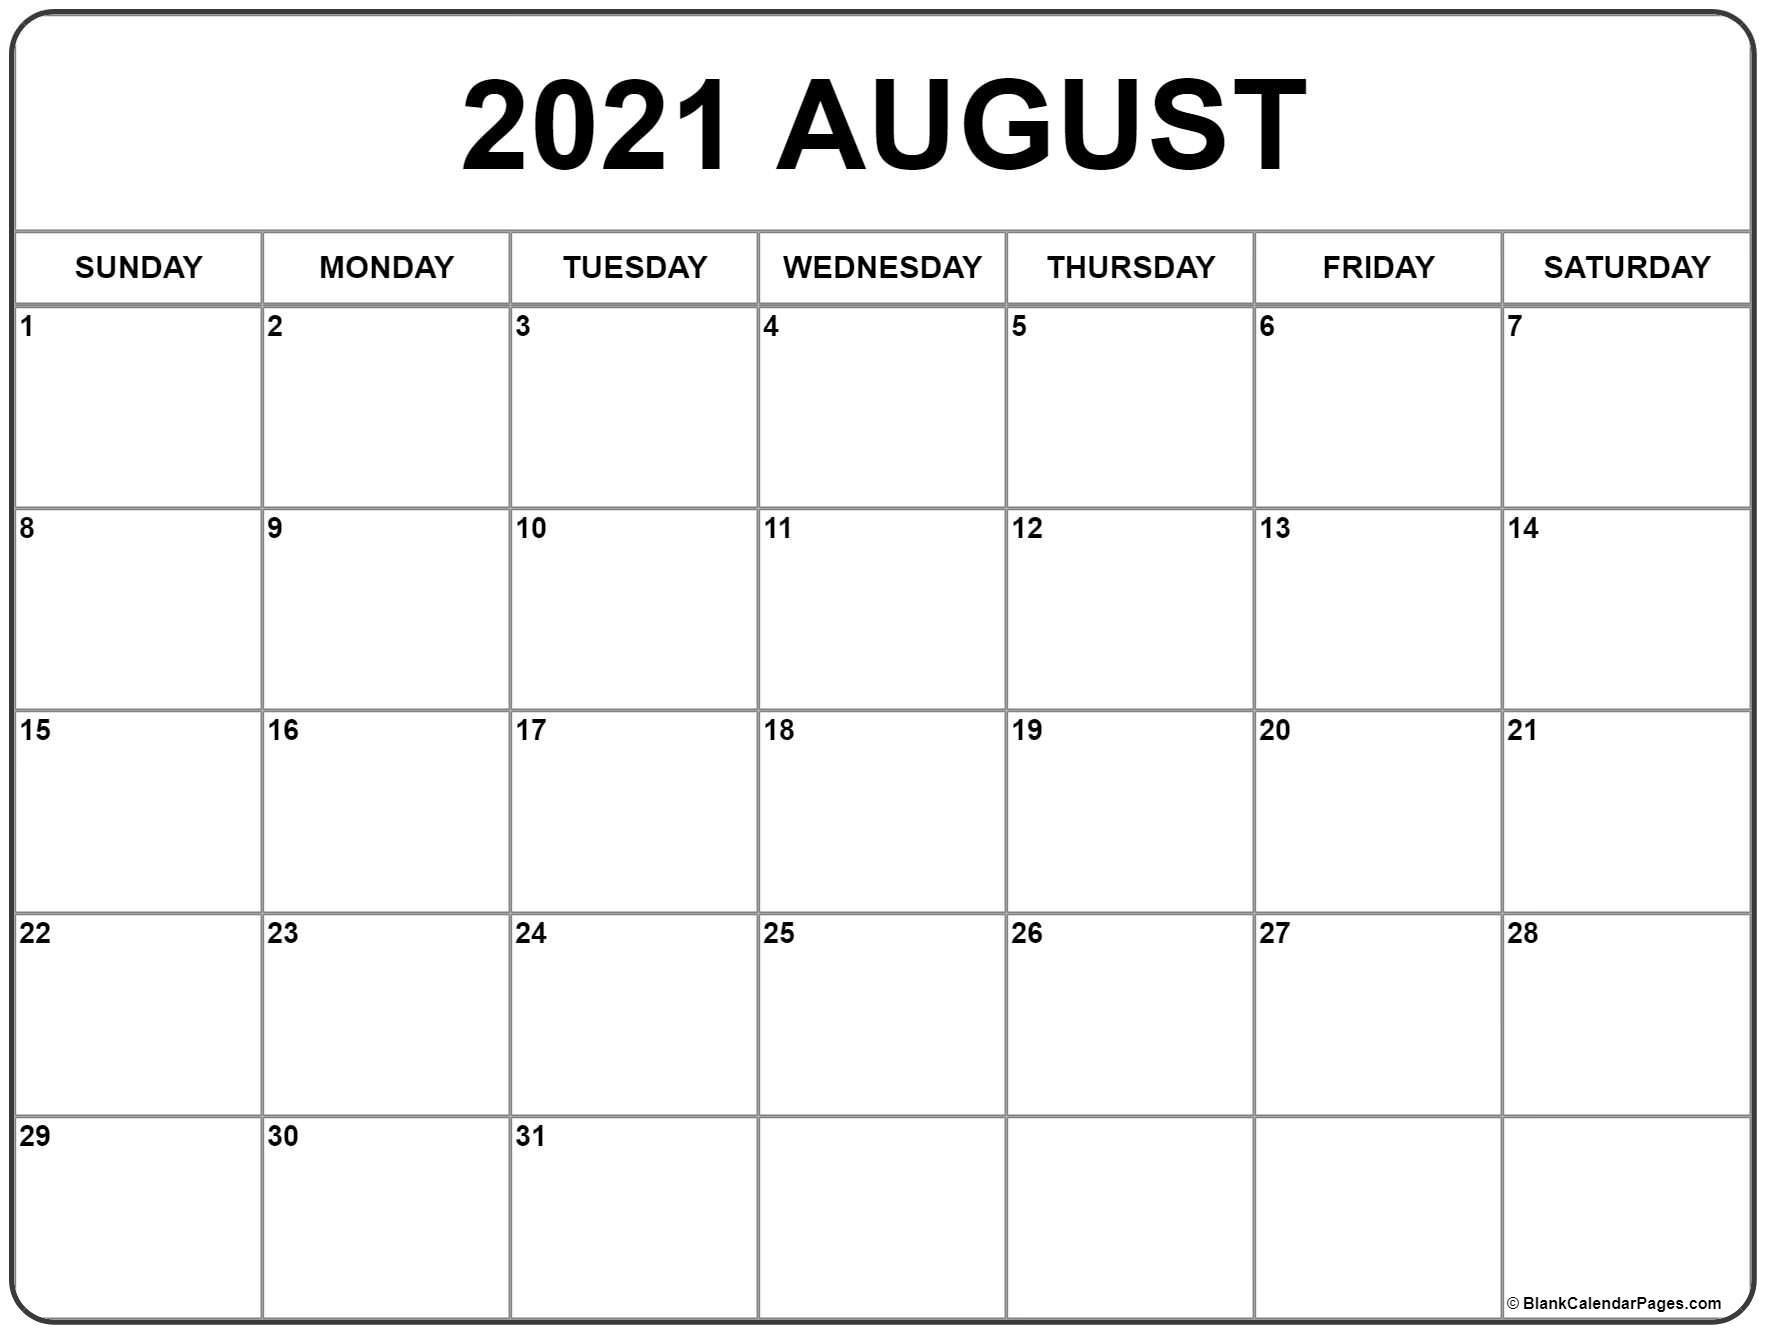 August 2021 Calendar | Free Printable Monthly Calendars  Calendar 2021 August To December